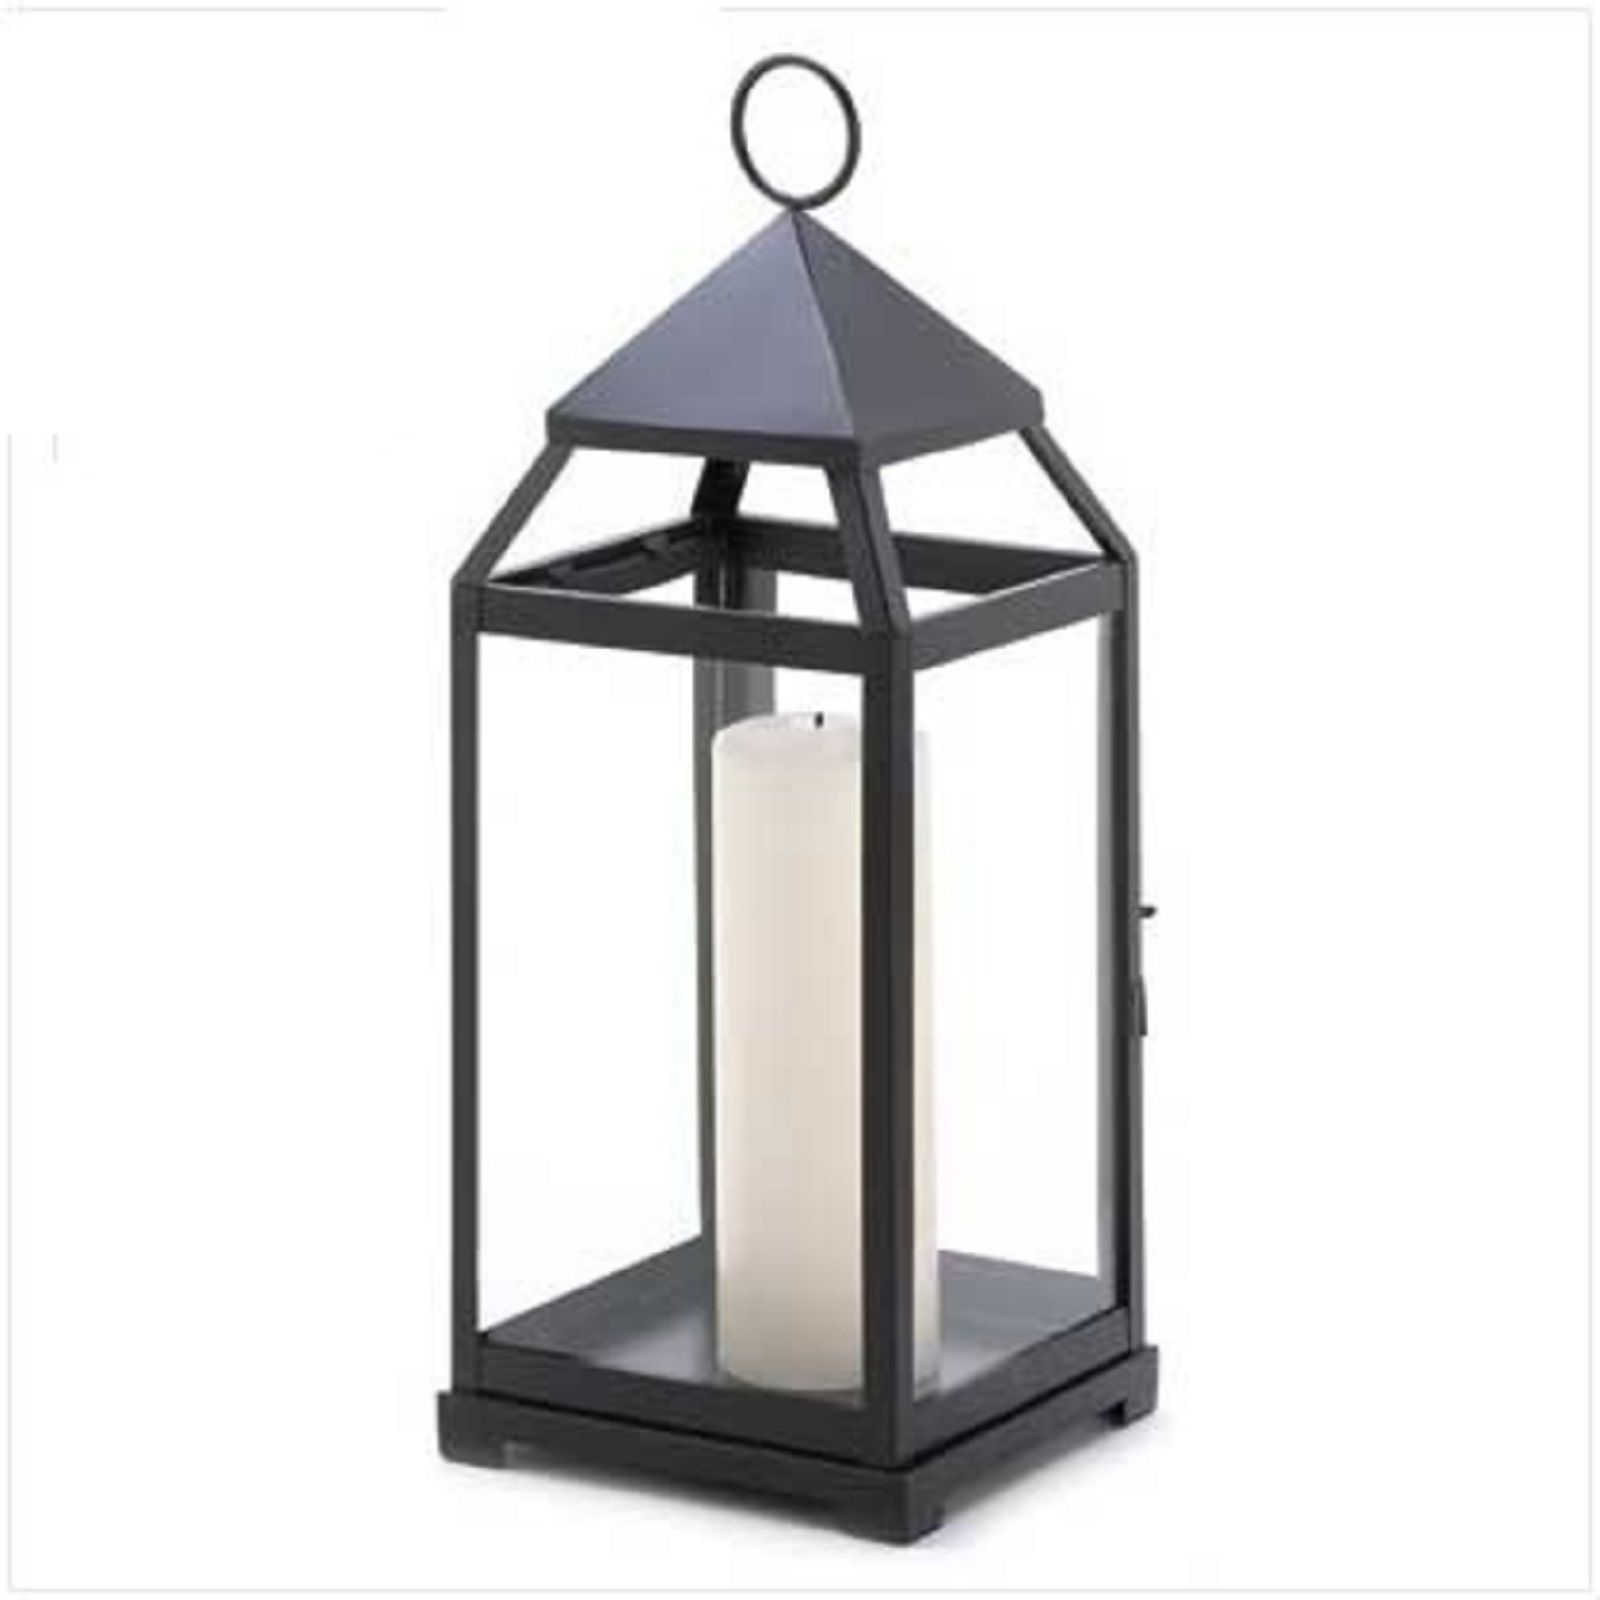 10 Black Lantern Candleholder Wedding Centerpieces